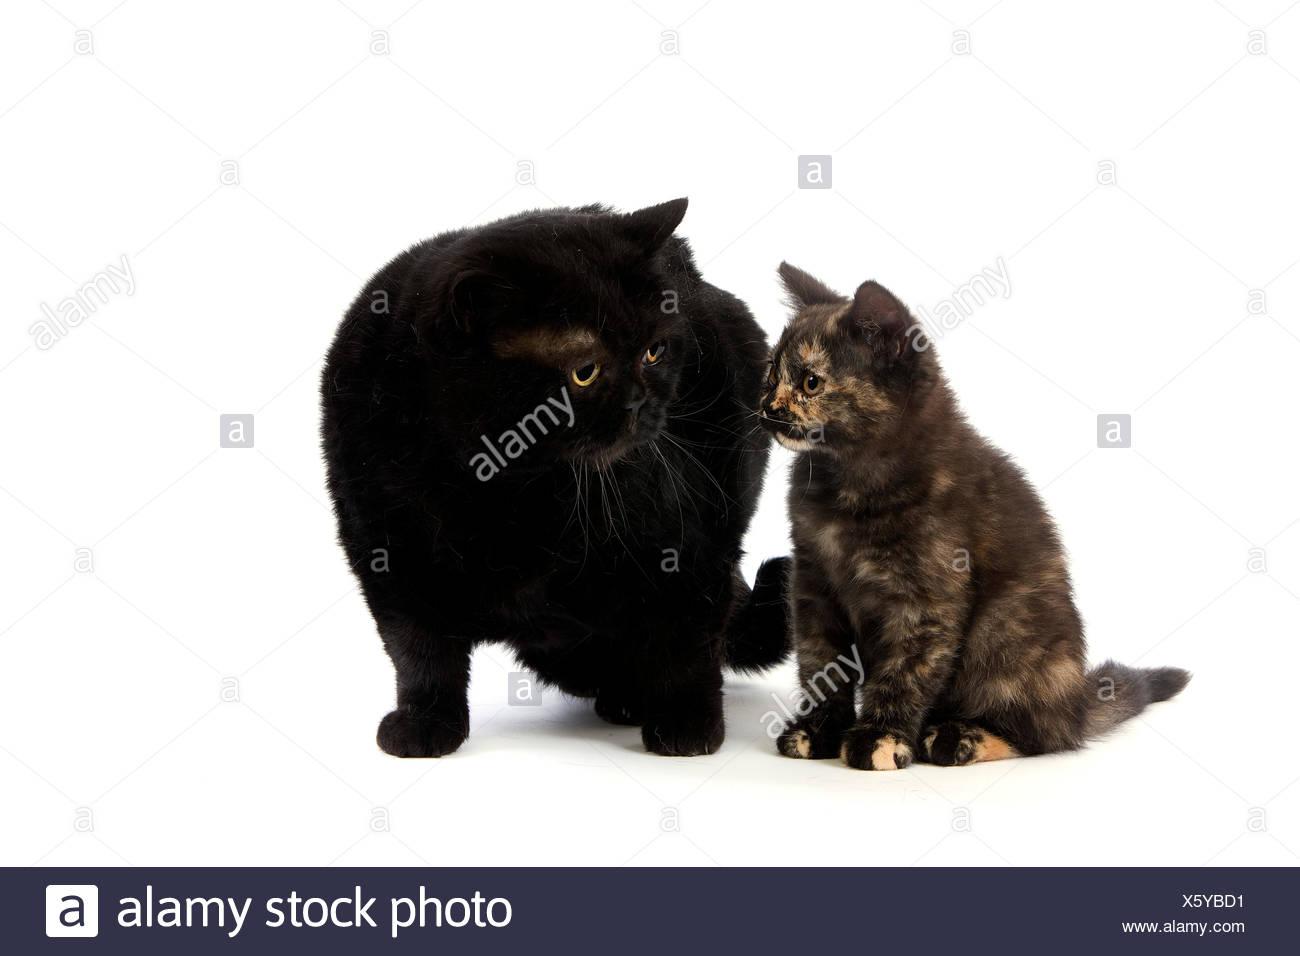 Black British Shorthair Mother and Black Tortoise-shell British Shorthair Kitten, Domestic Cat against White Background Stock Photo